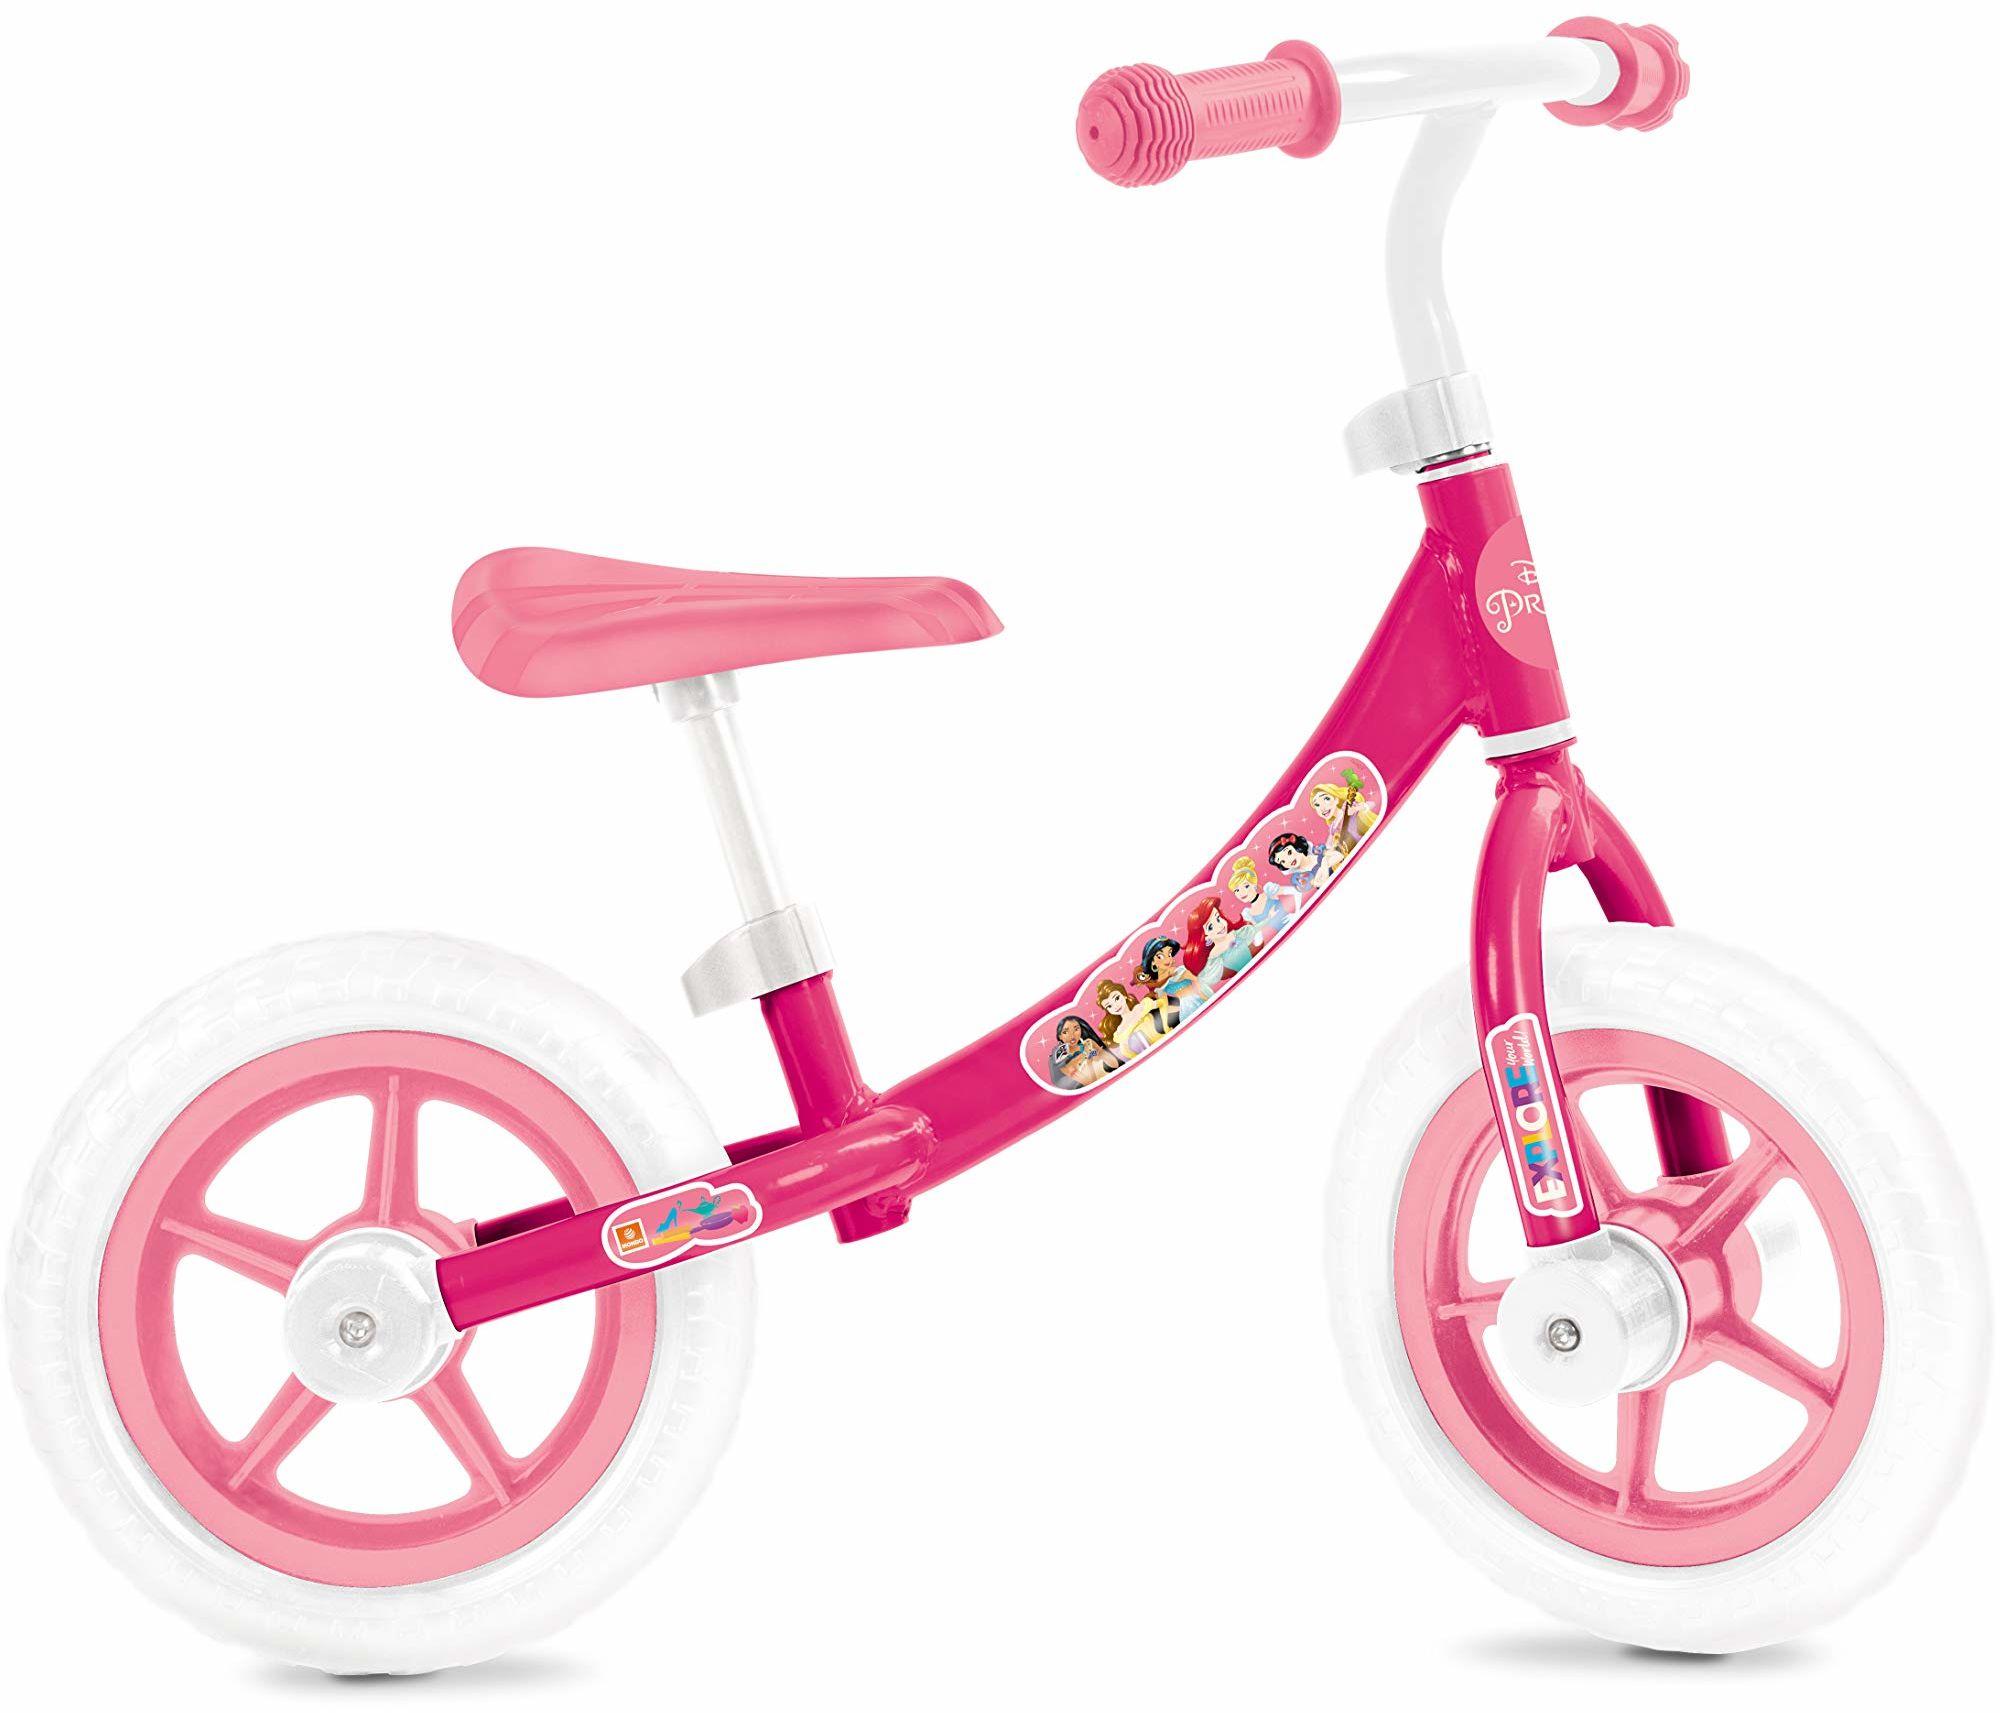 Mondo -28500 Princess Balance Bike, biało-różowa, 28500